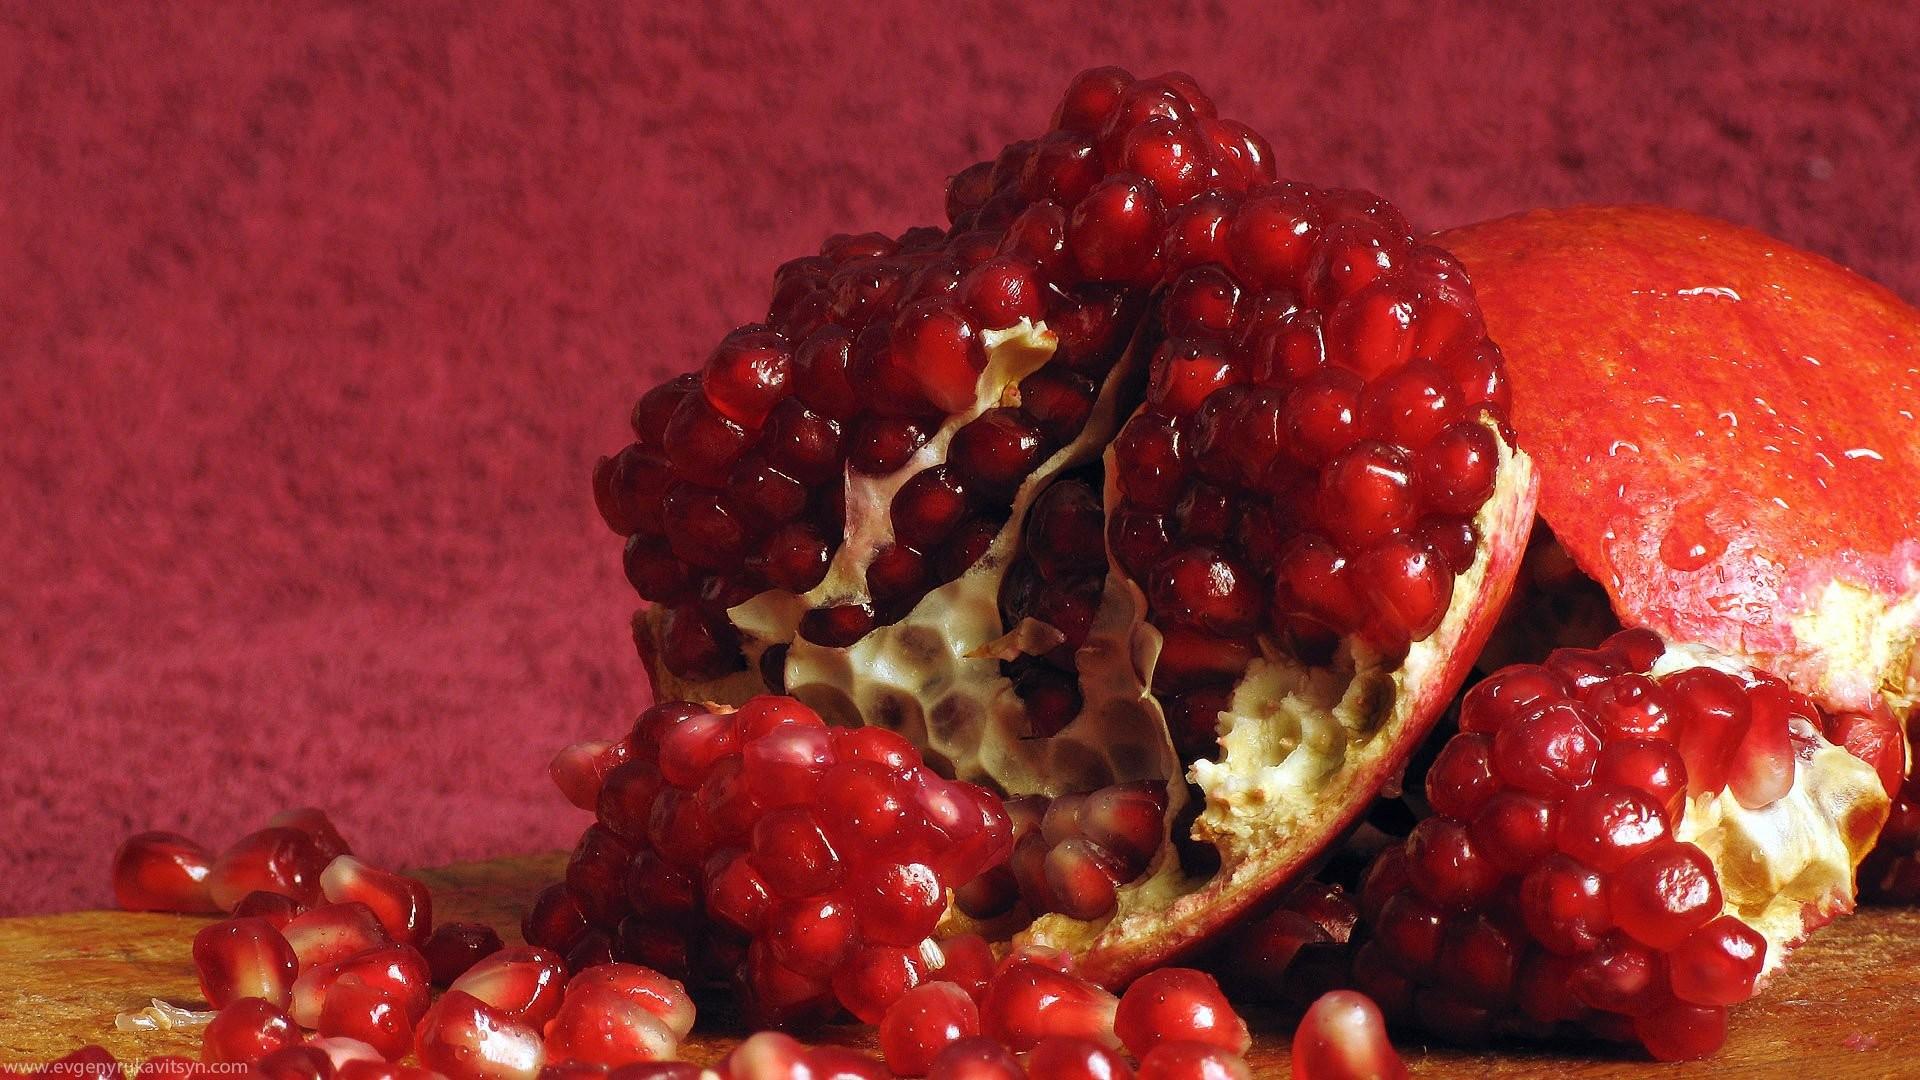 Pomegranate download wallpaper image